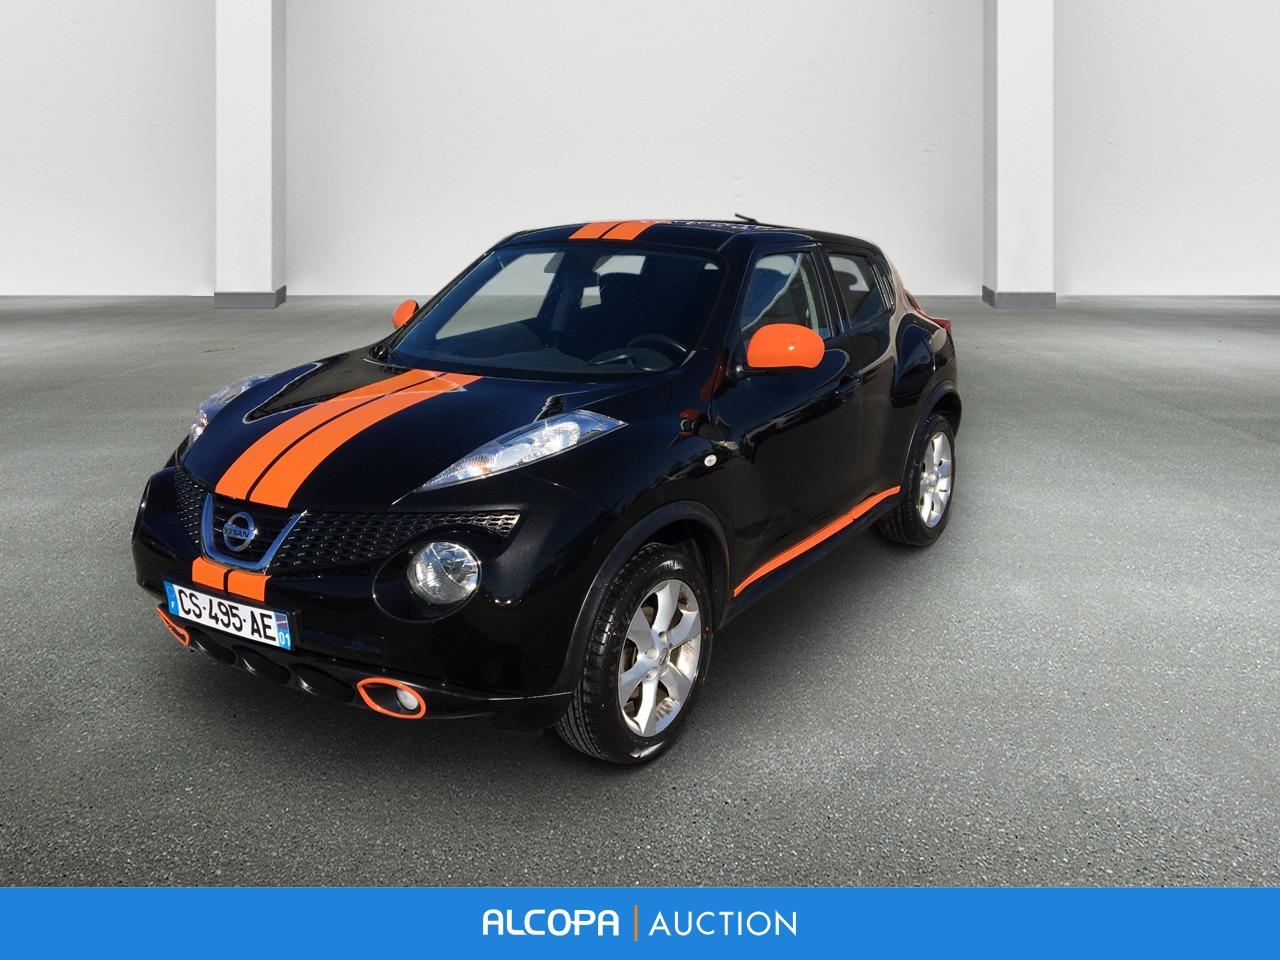 Fap Nissan Juke : nissan juke juke 1 5 dci 110 fap acenta lyon alcopa auction ~ Farleysfitness.com Idées de Décoration